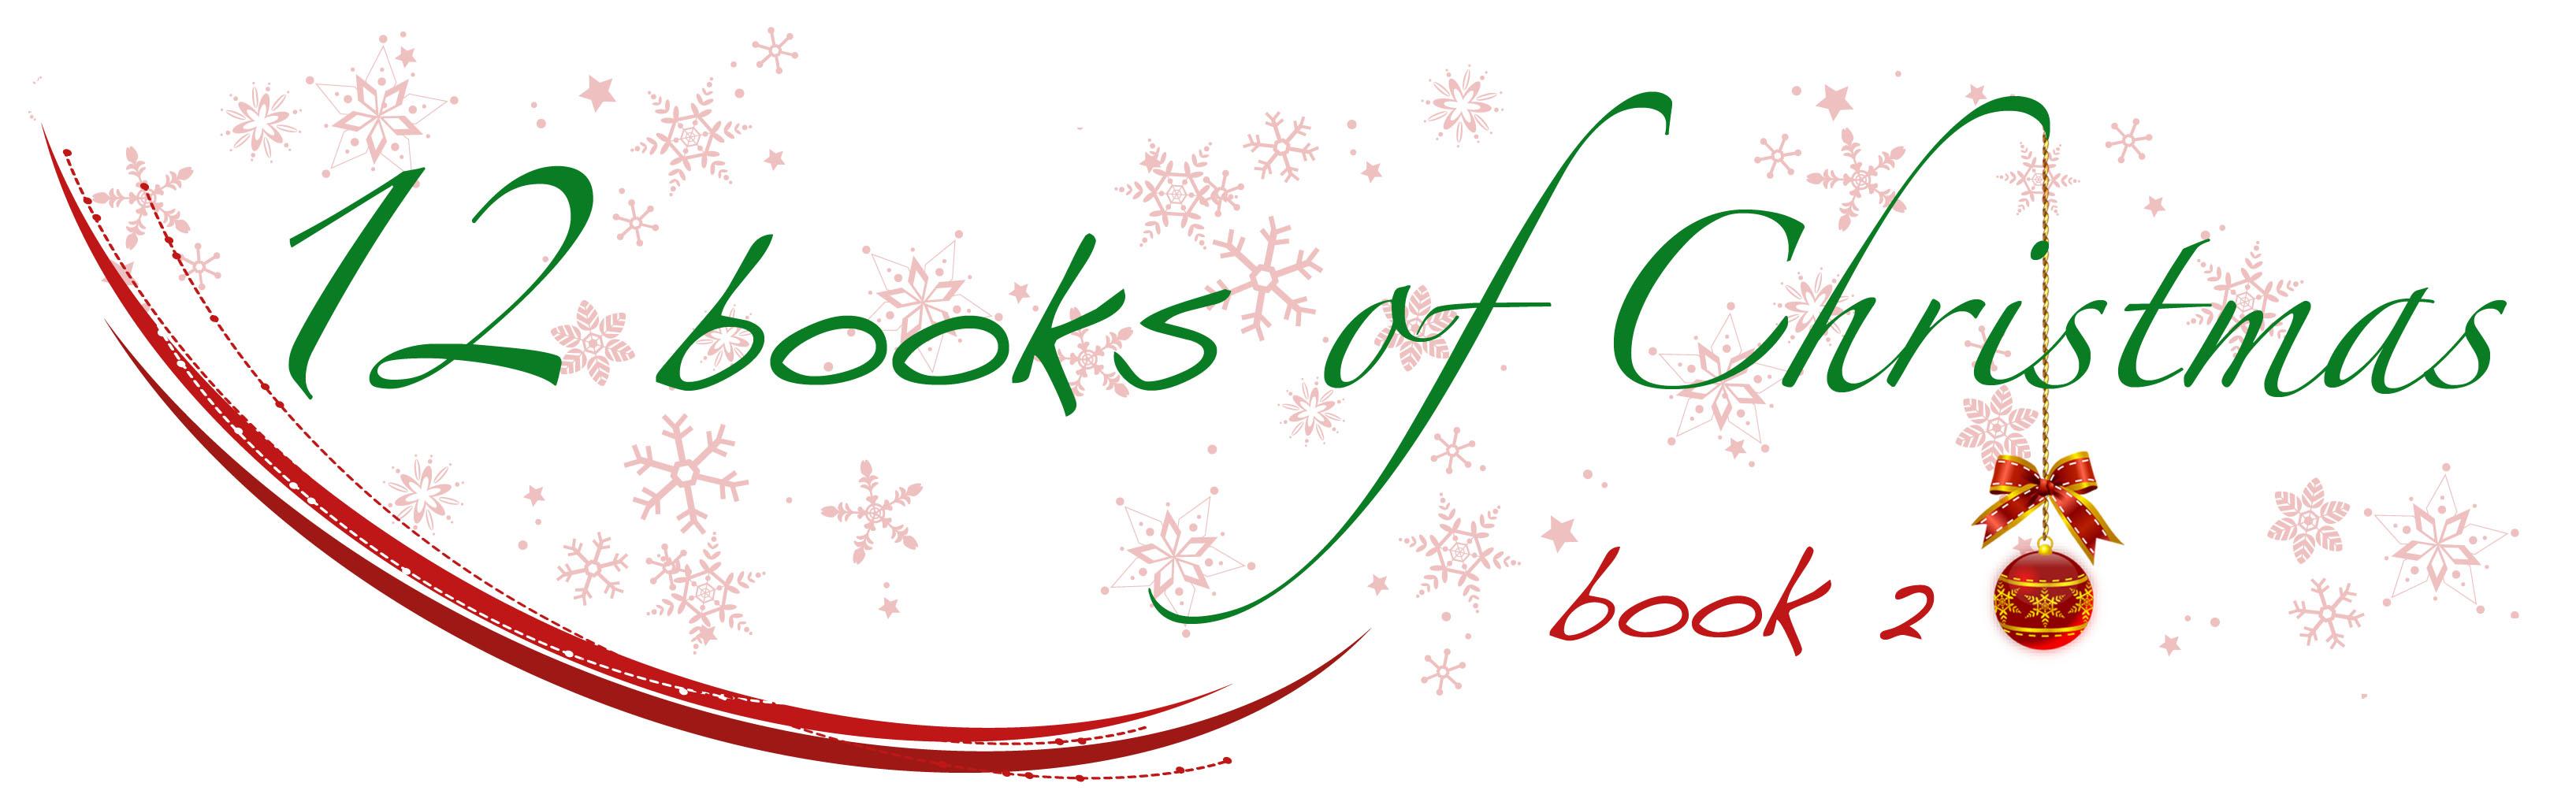 With Love at Christmas – Carole Mathews